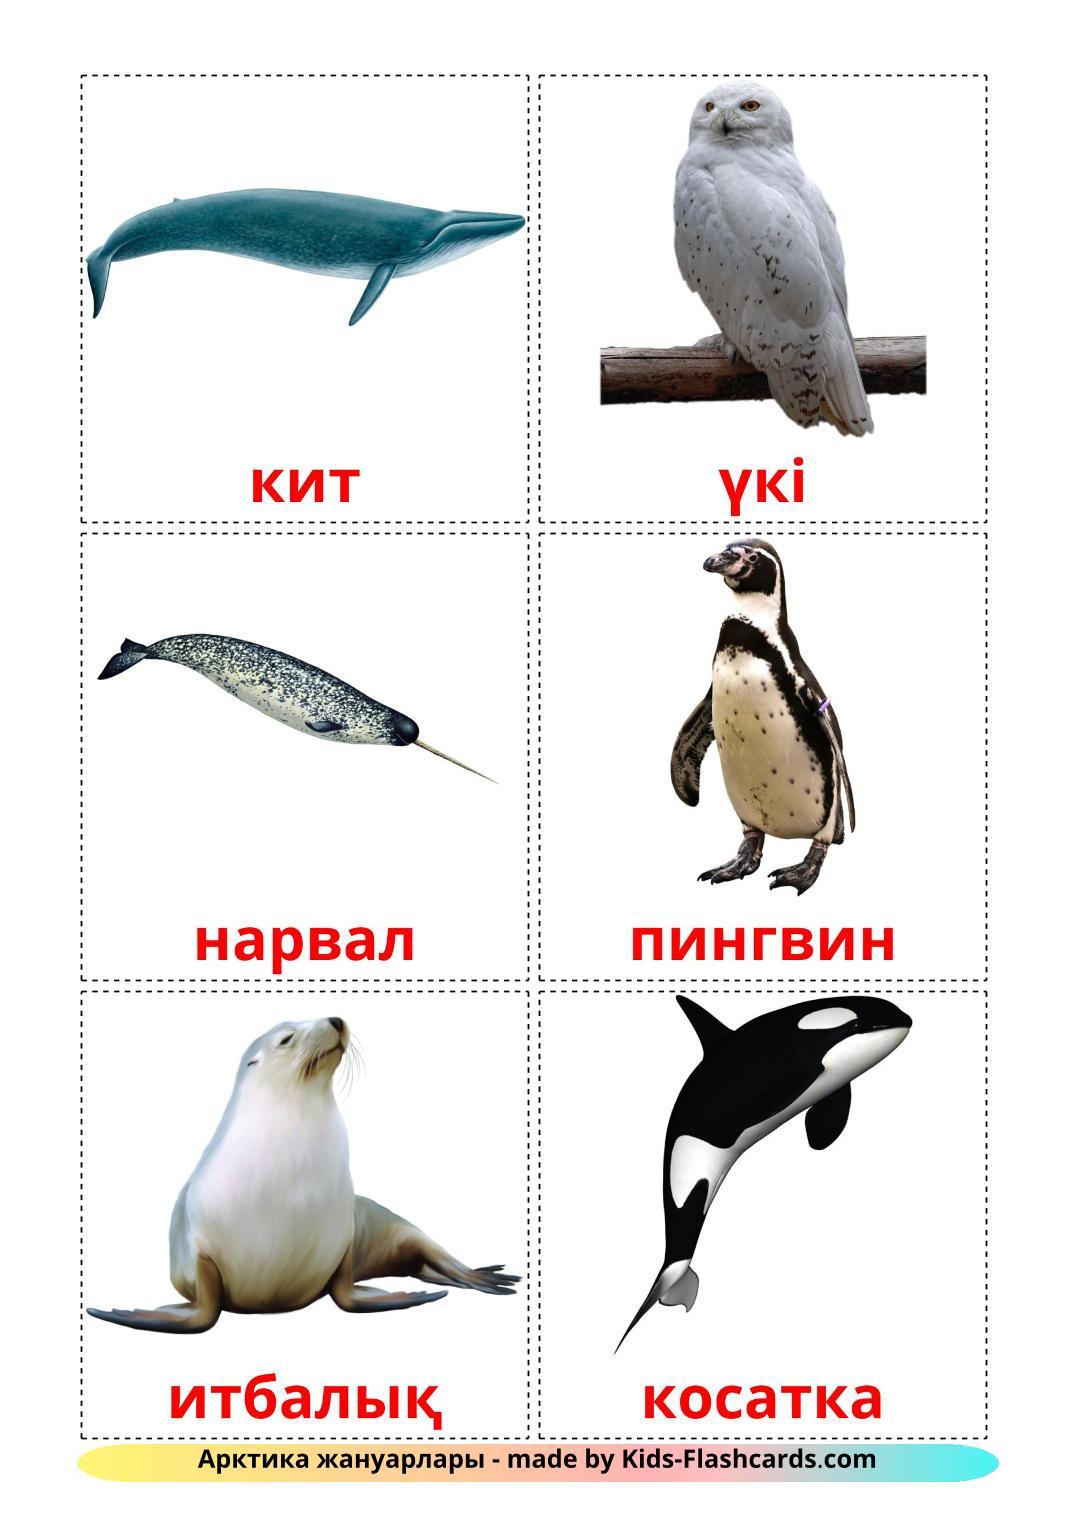 Arctic animals - 14 Free Printable kazakh Flashcards